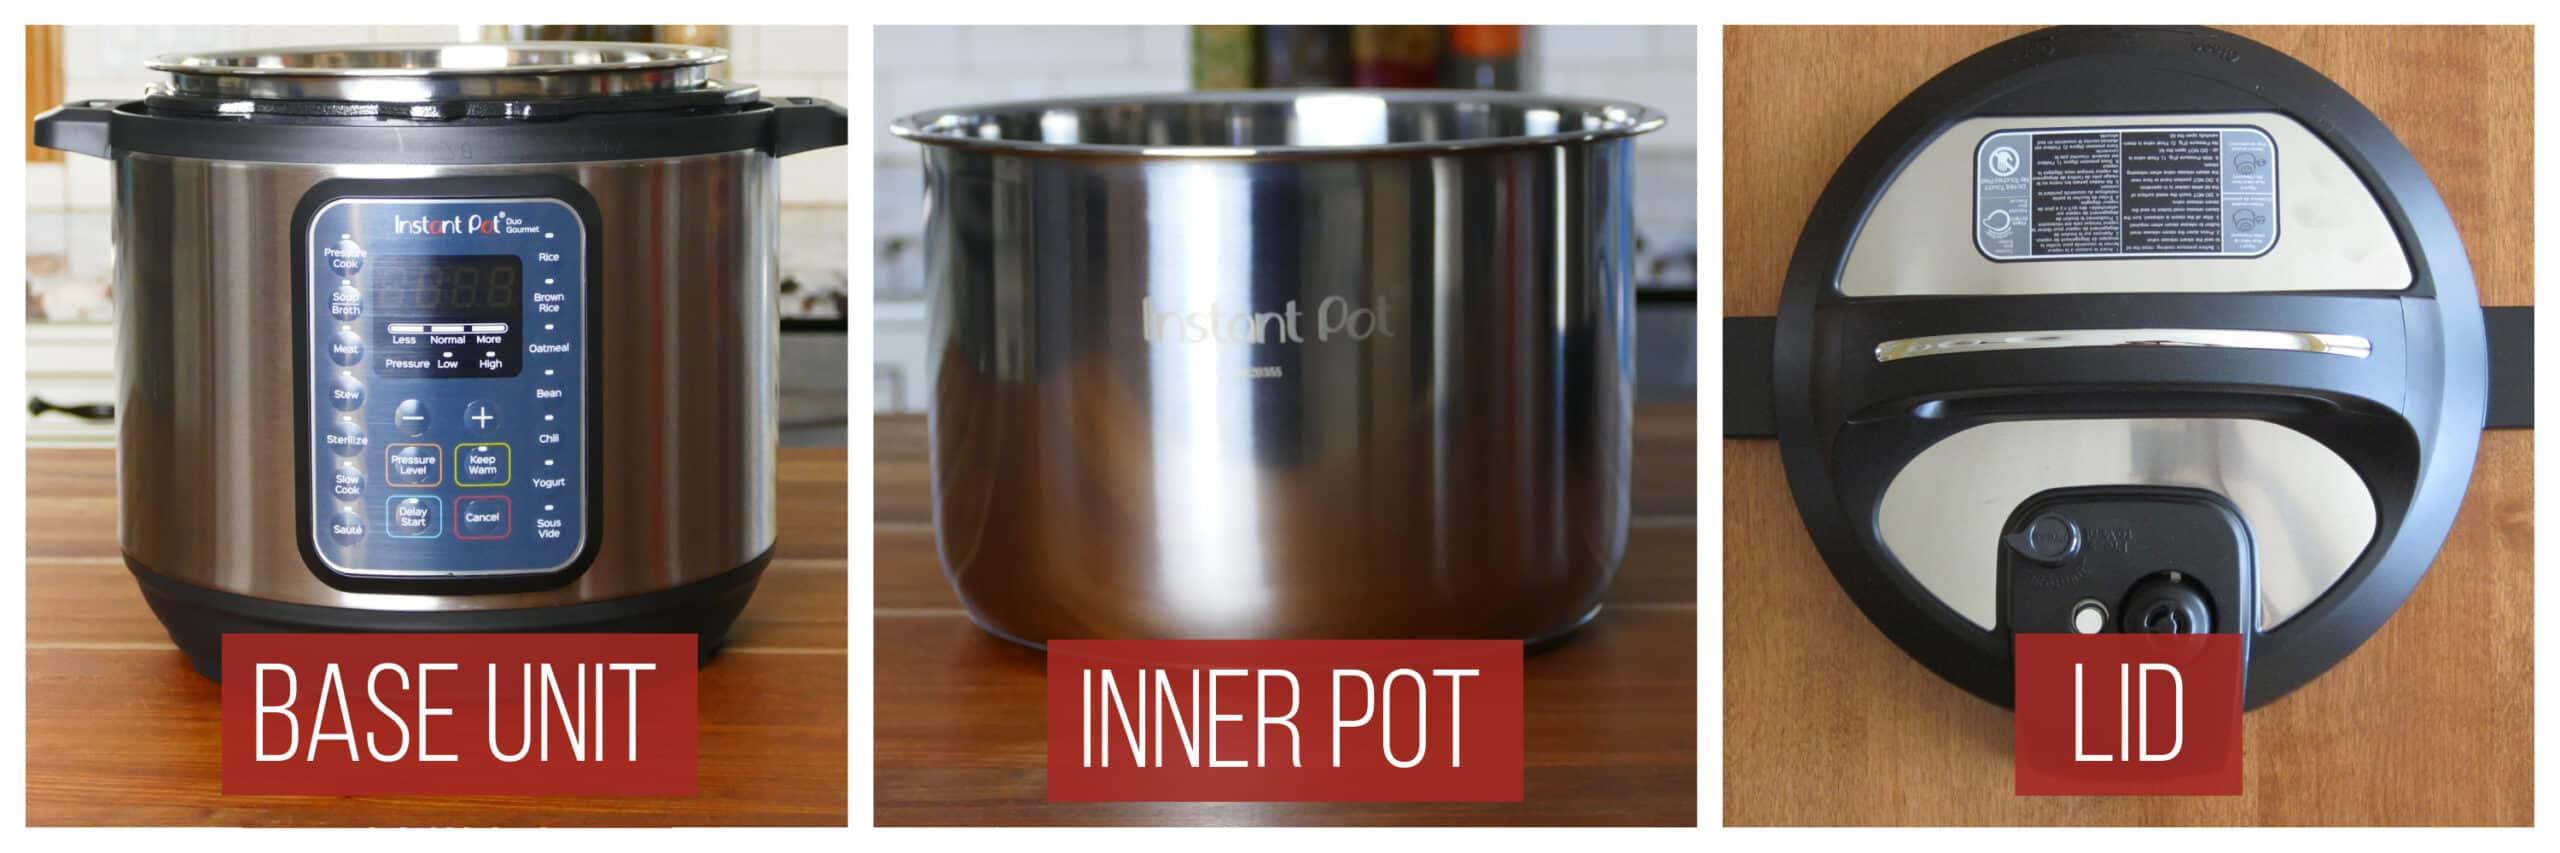 Instant Pot Duo Gourmet Parts collage - base unit, inner pot, lid